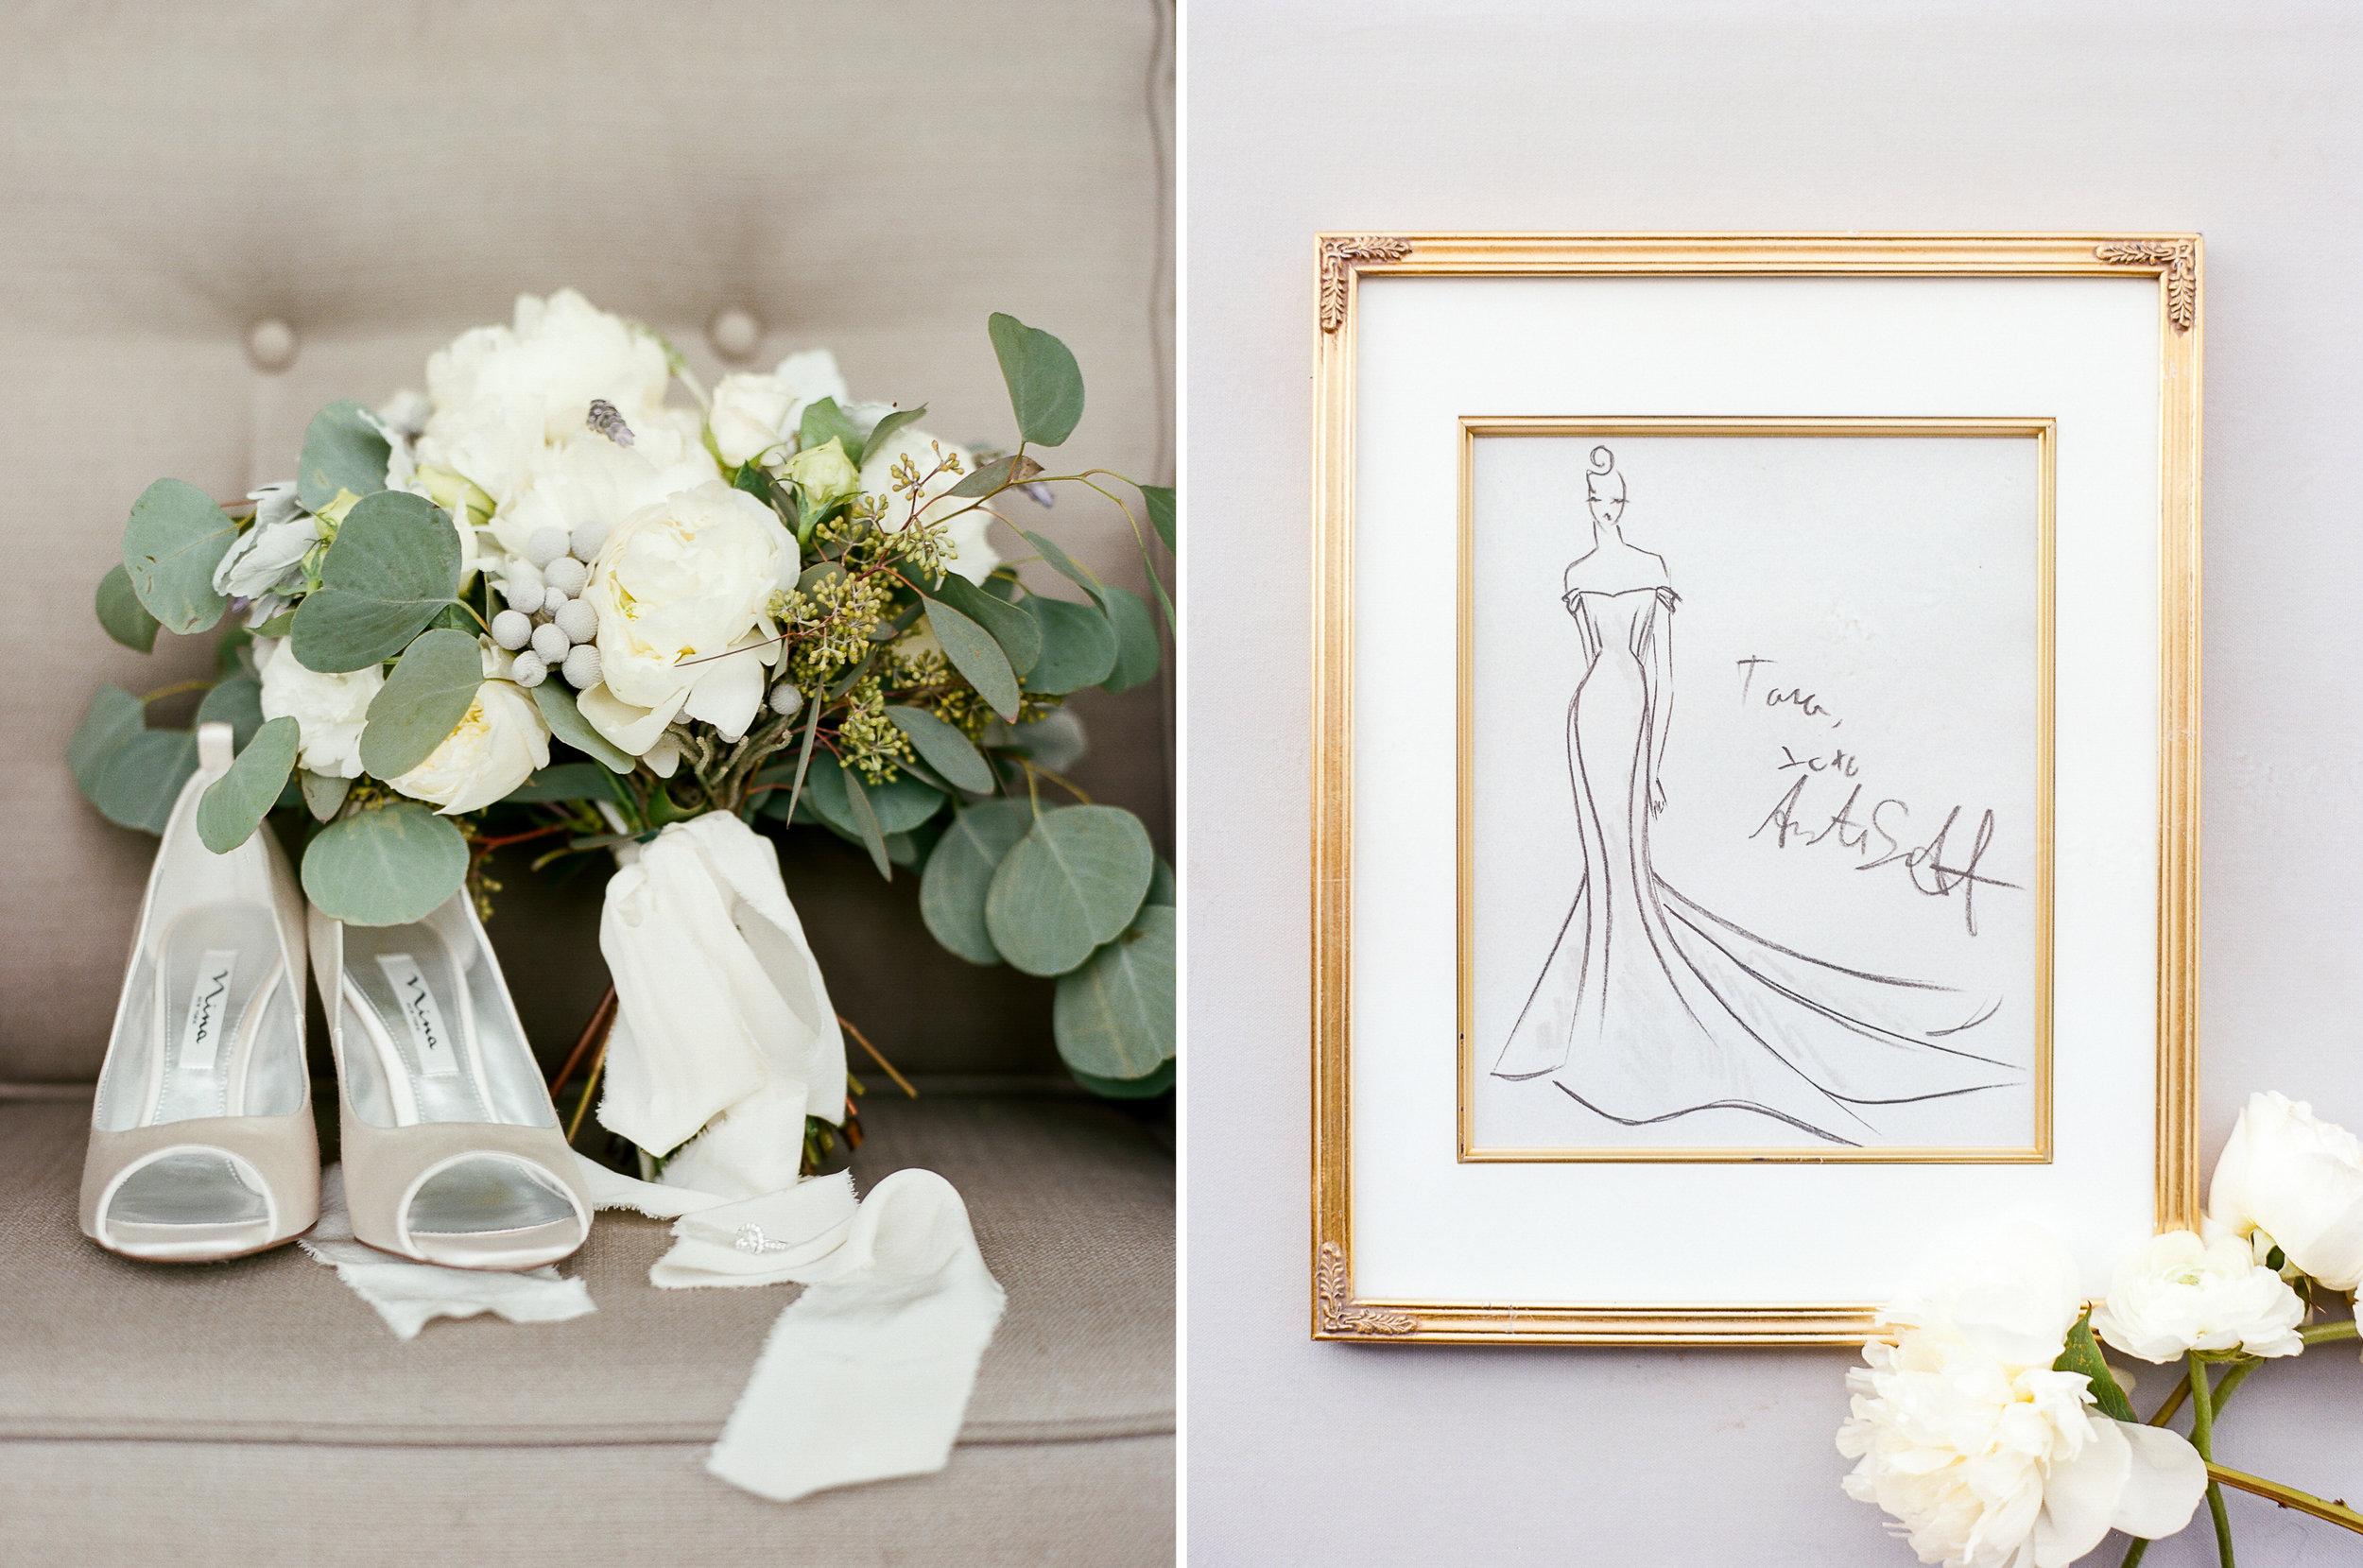 Fine-Art-Film-Houston-Wedding-Photographer-Best-Top-Luxury-Texas-Austin-Dallas-Destination-Dana-Fernandez-Photography-The-Bell-Tower-on-34th-Indian-101.jpg